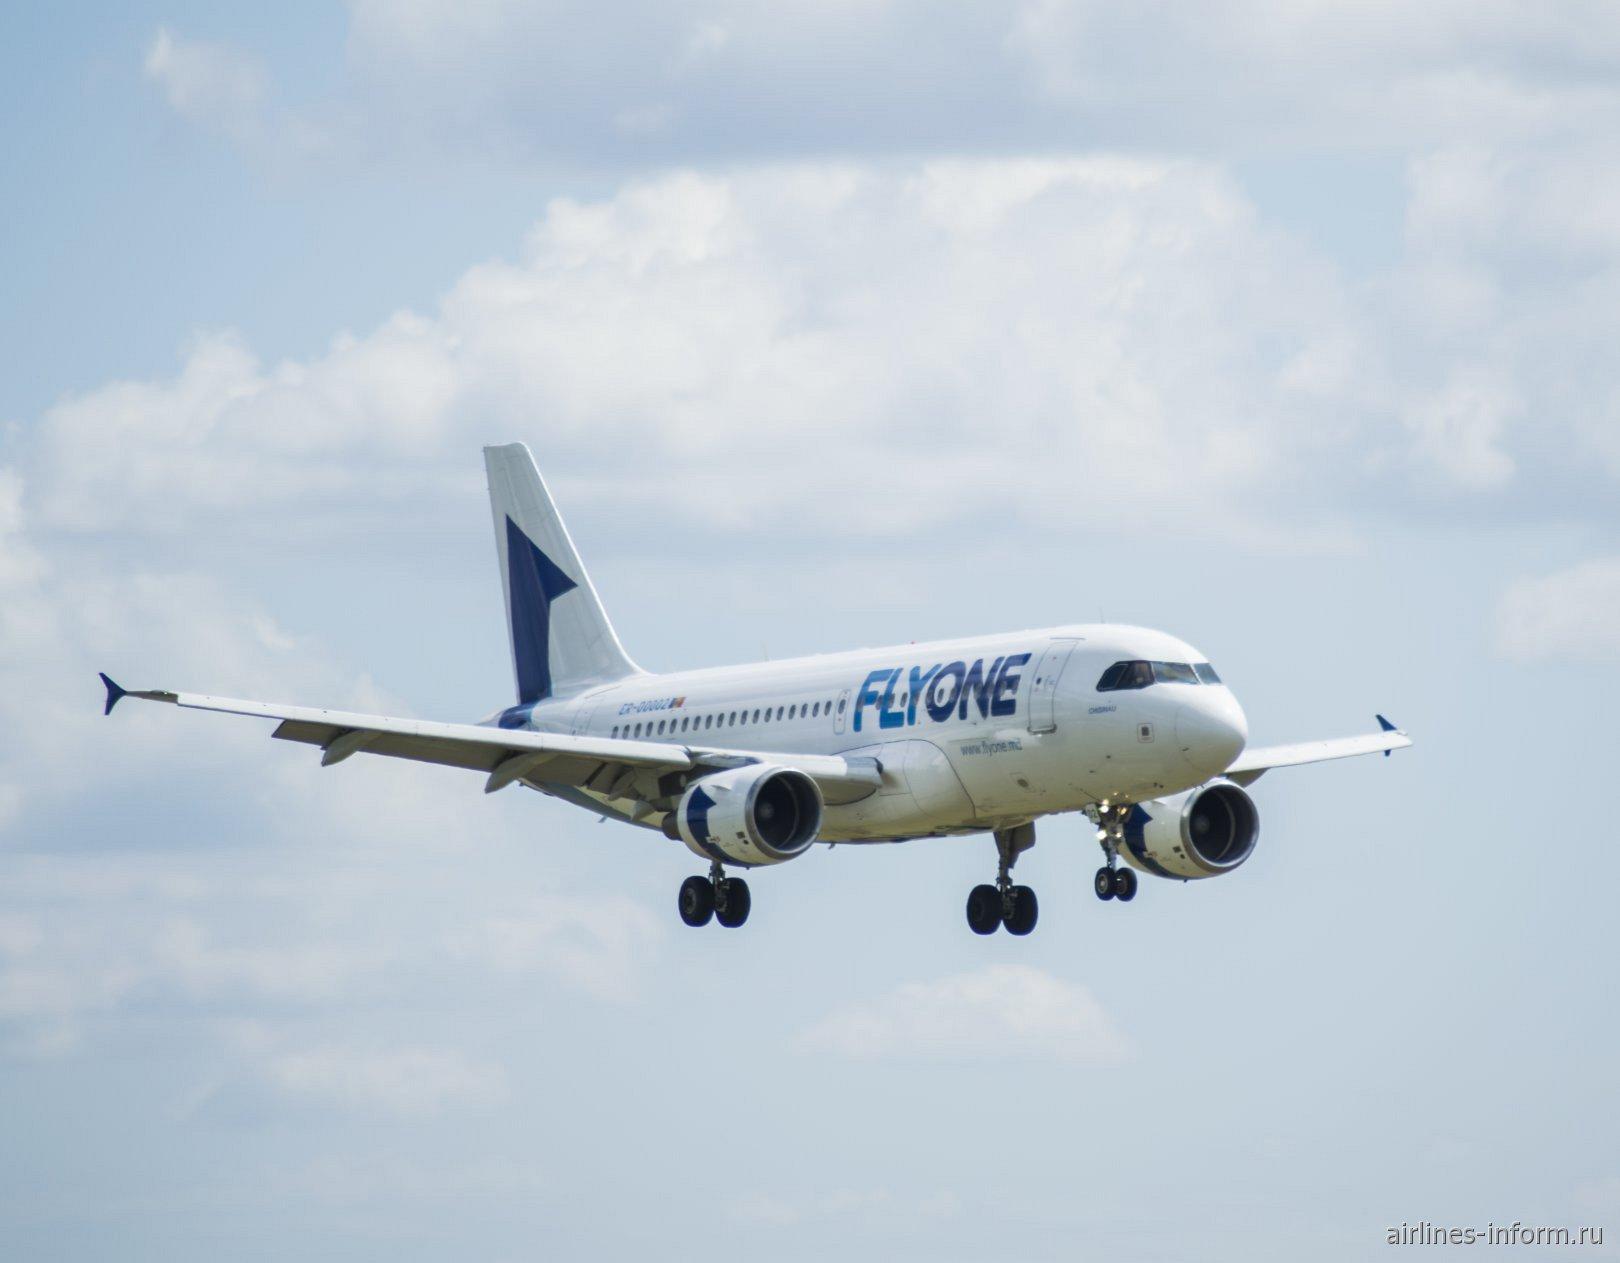 Airbus A320 ER-00002 авиакомпании Fly One перед посадкой в аэропорту Внуково